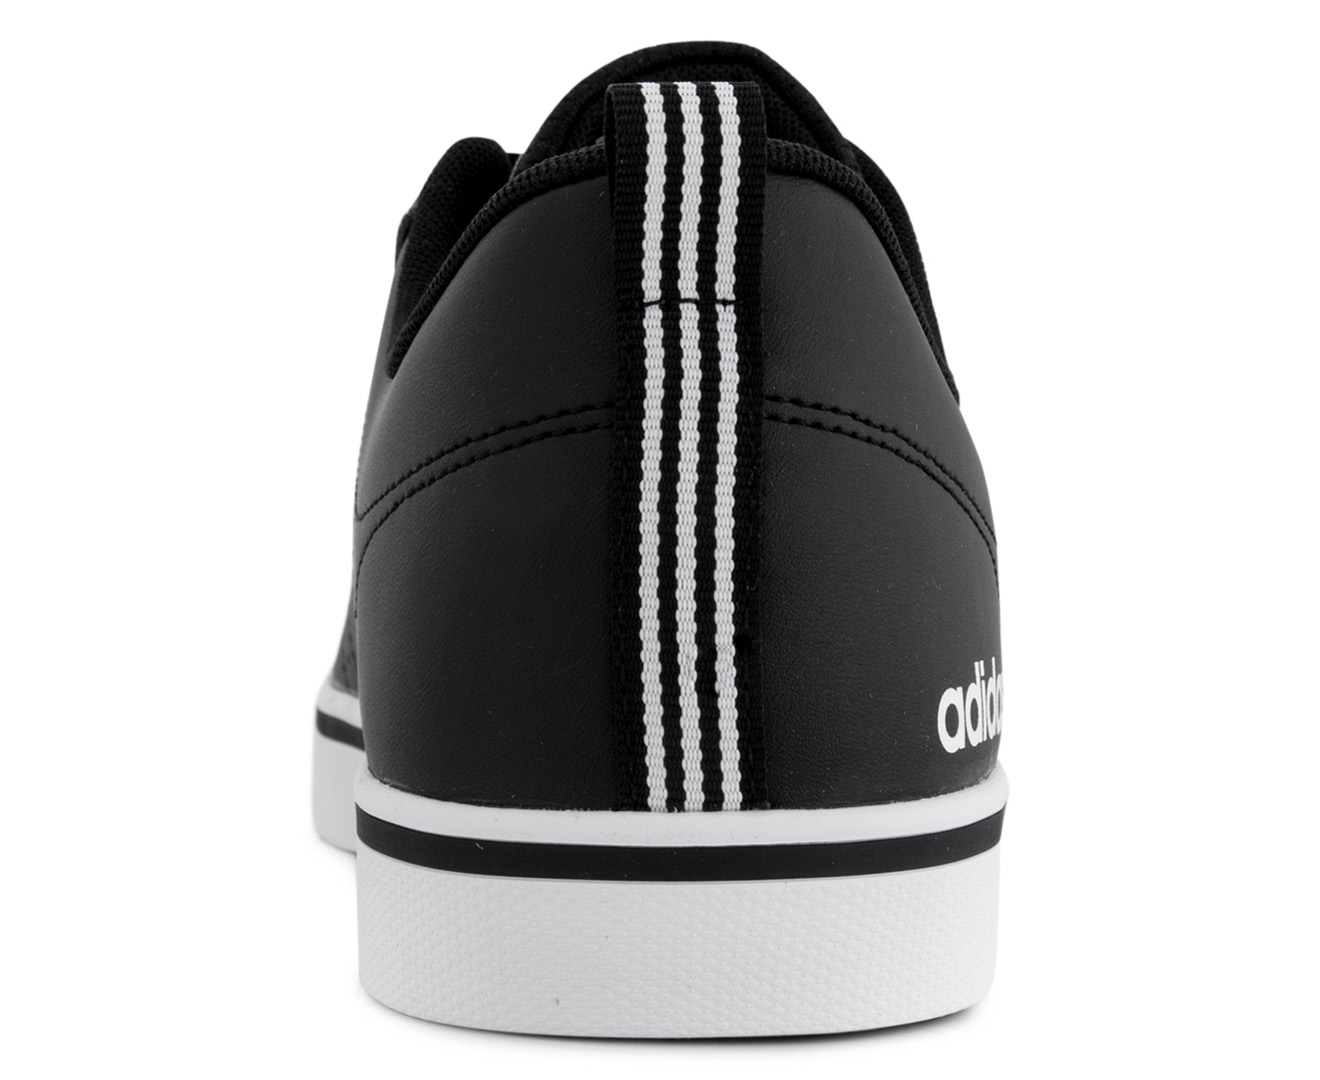 a51096f7b138e Adidas NEO Men s VS Pace Leather Shoe - Black White Scarlet